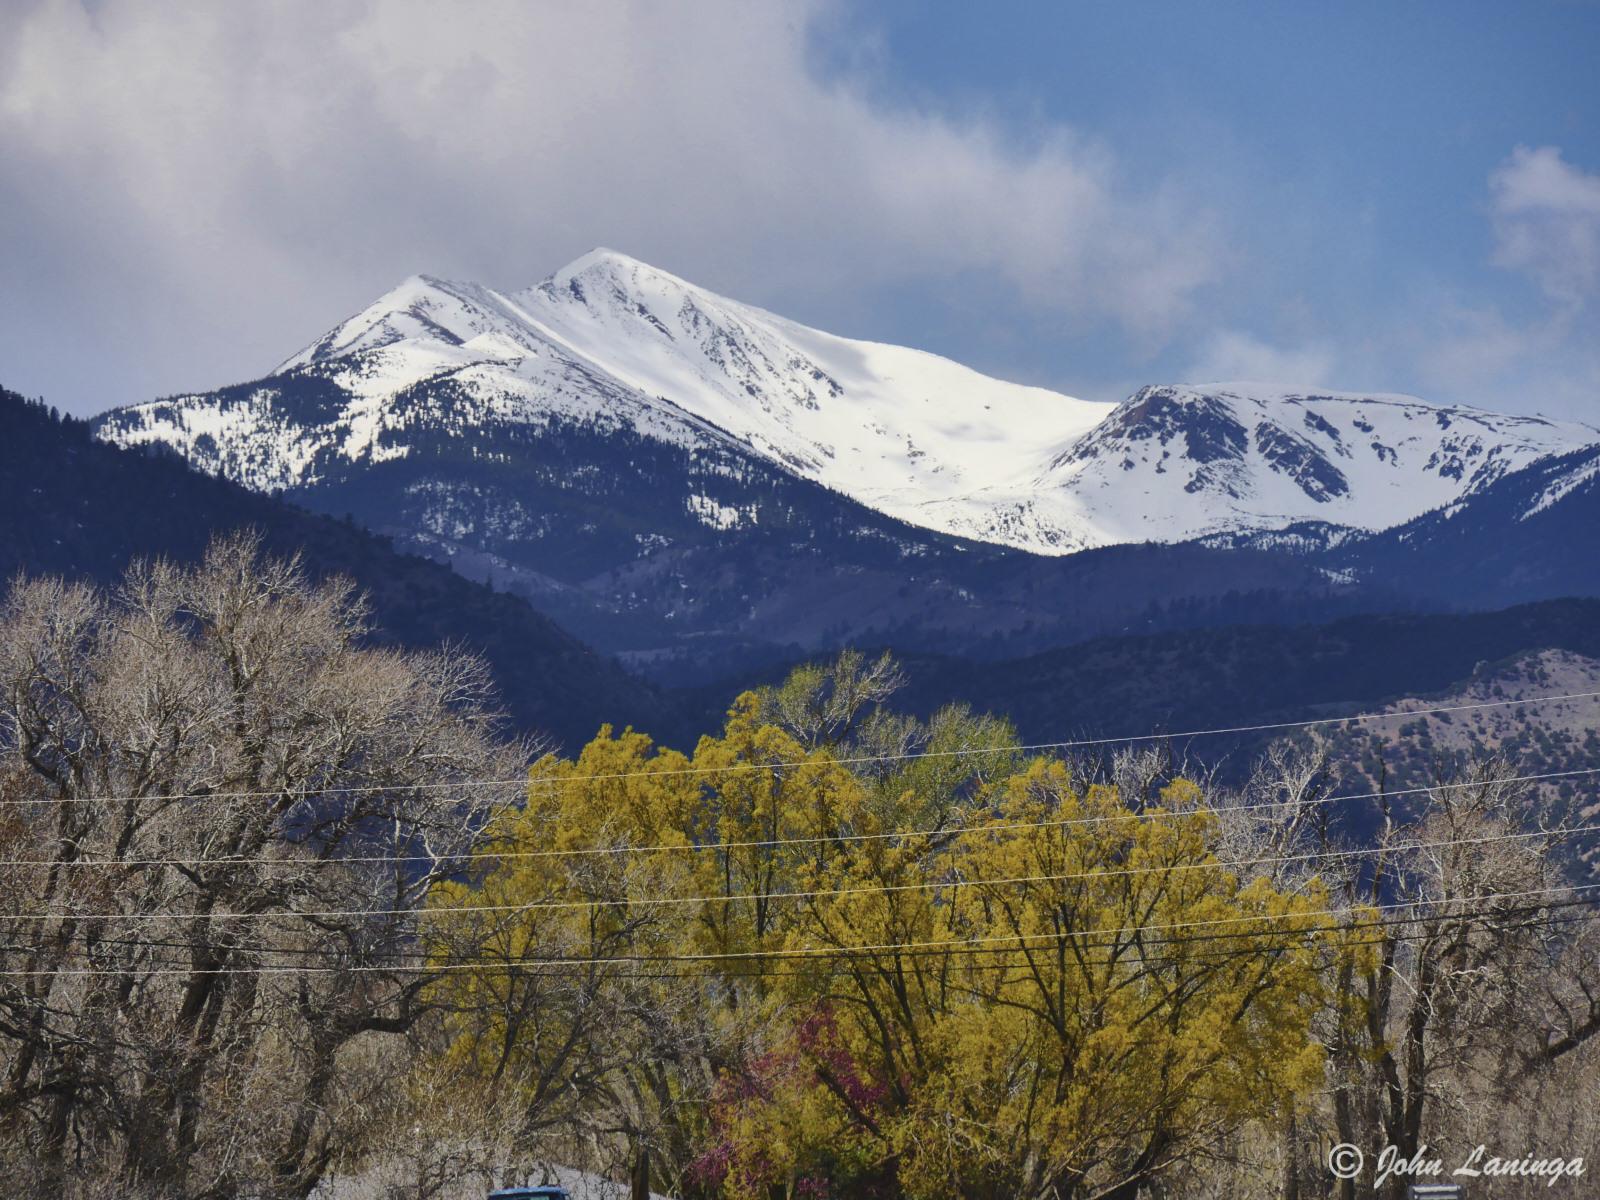 A nearby mountain peak